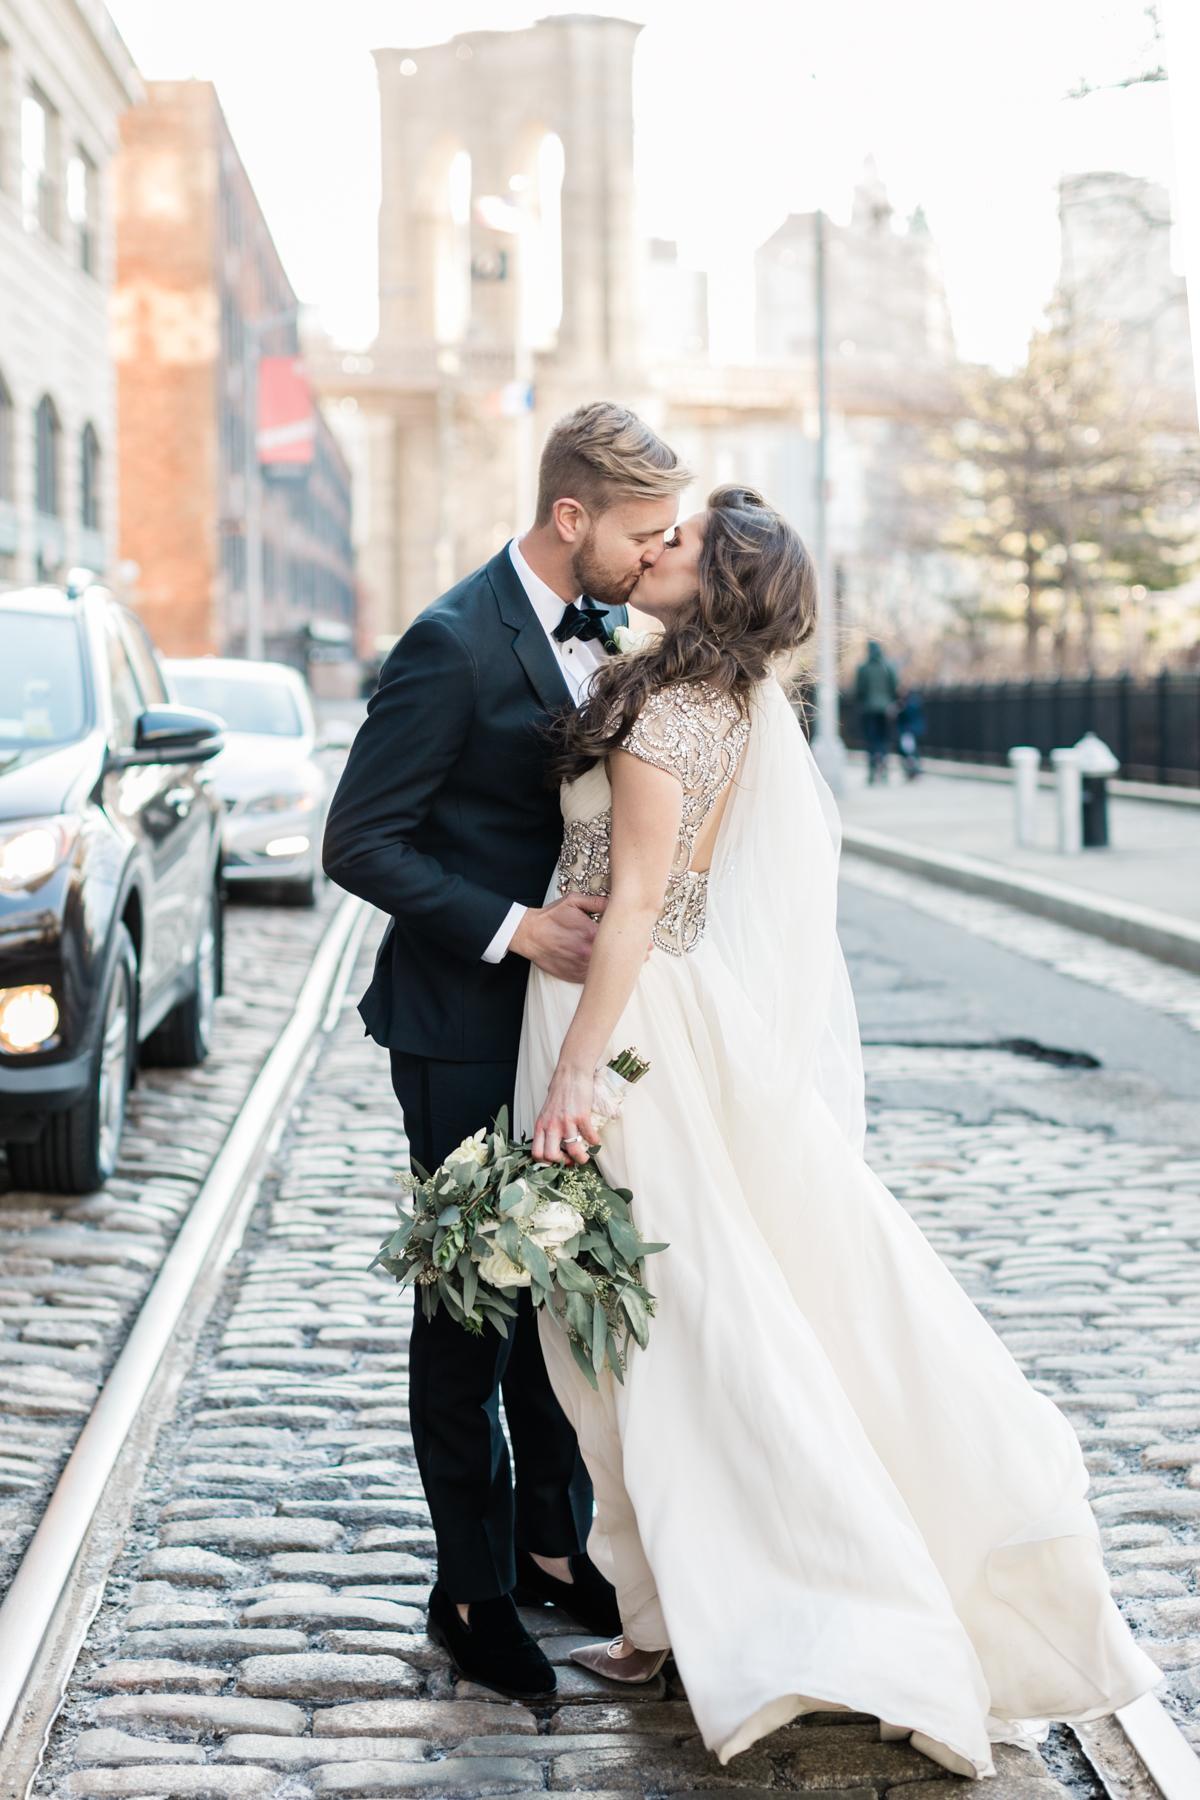 New York City Wedding Photographer  501 Union Wedding Photos